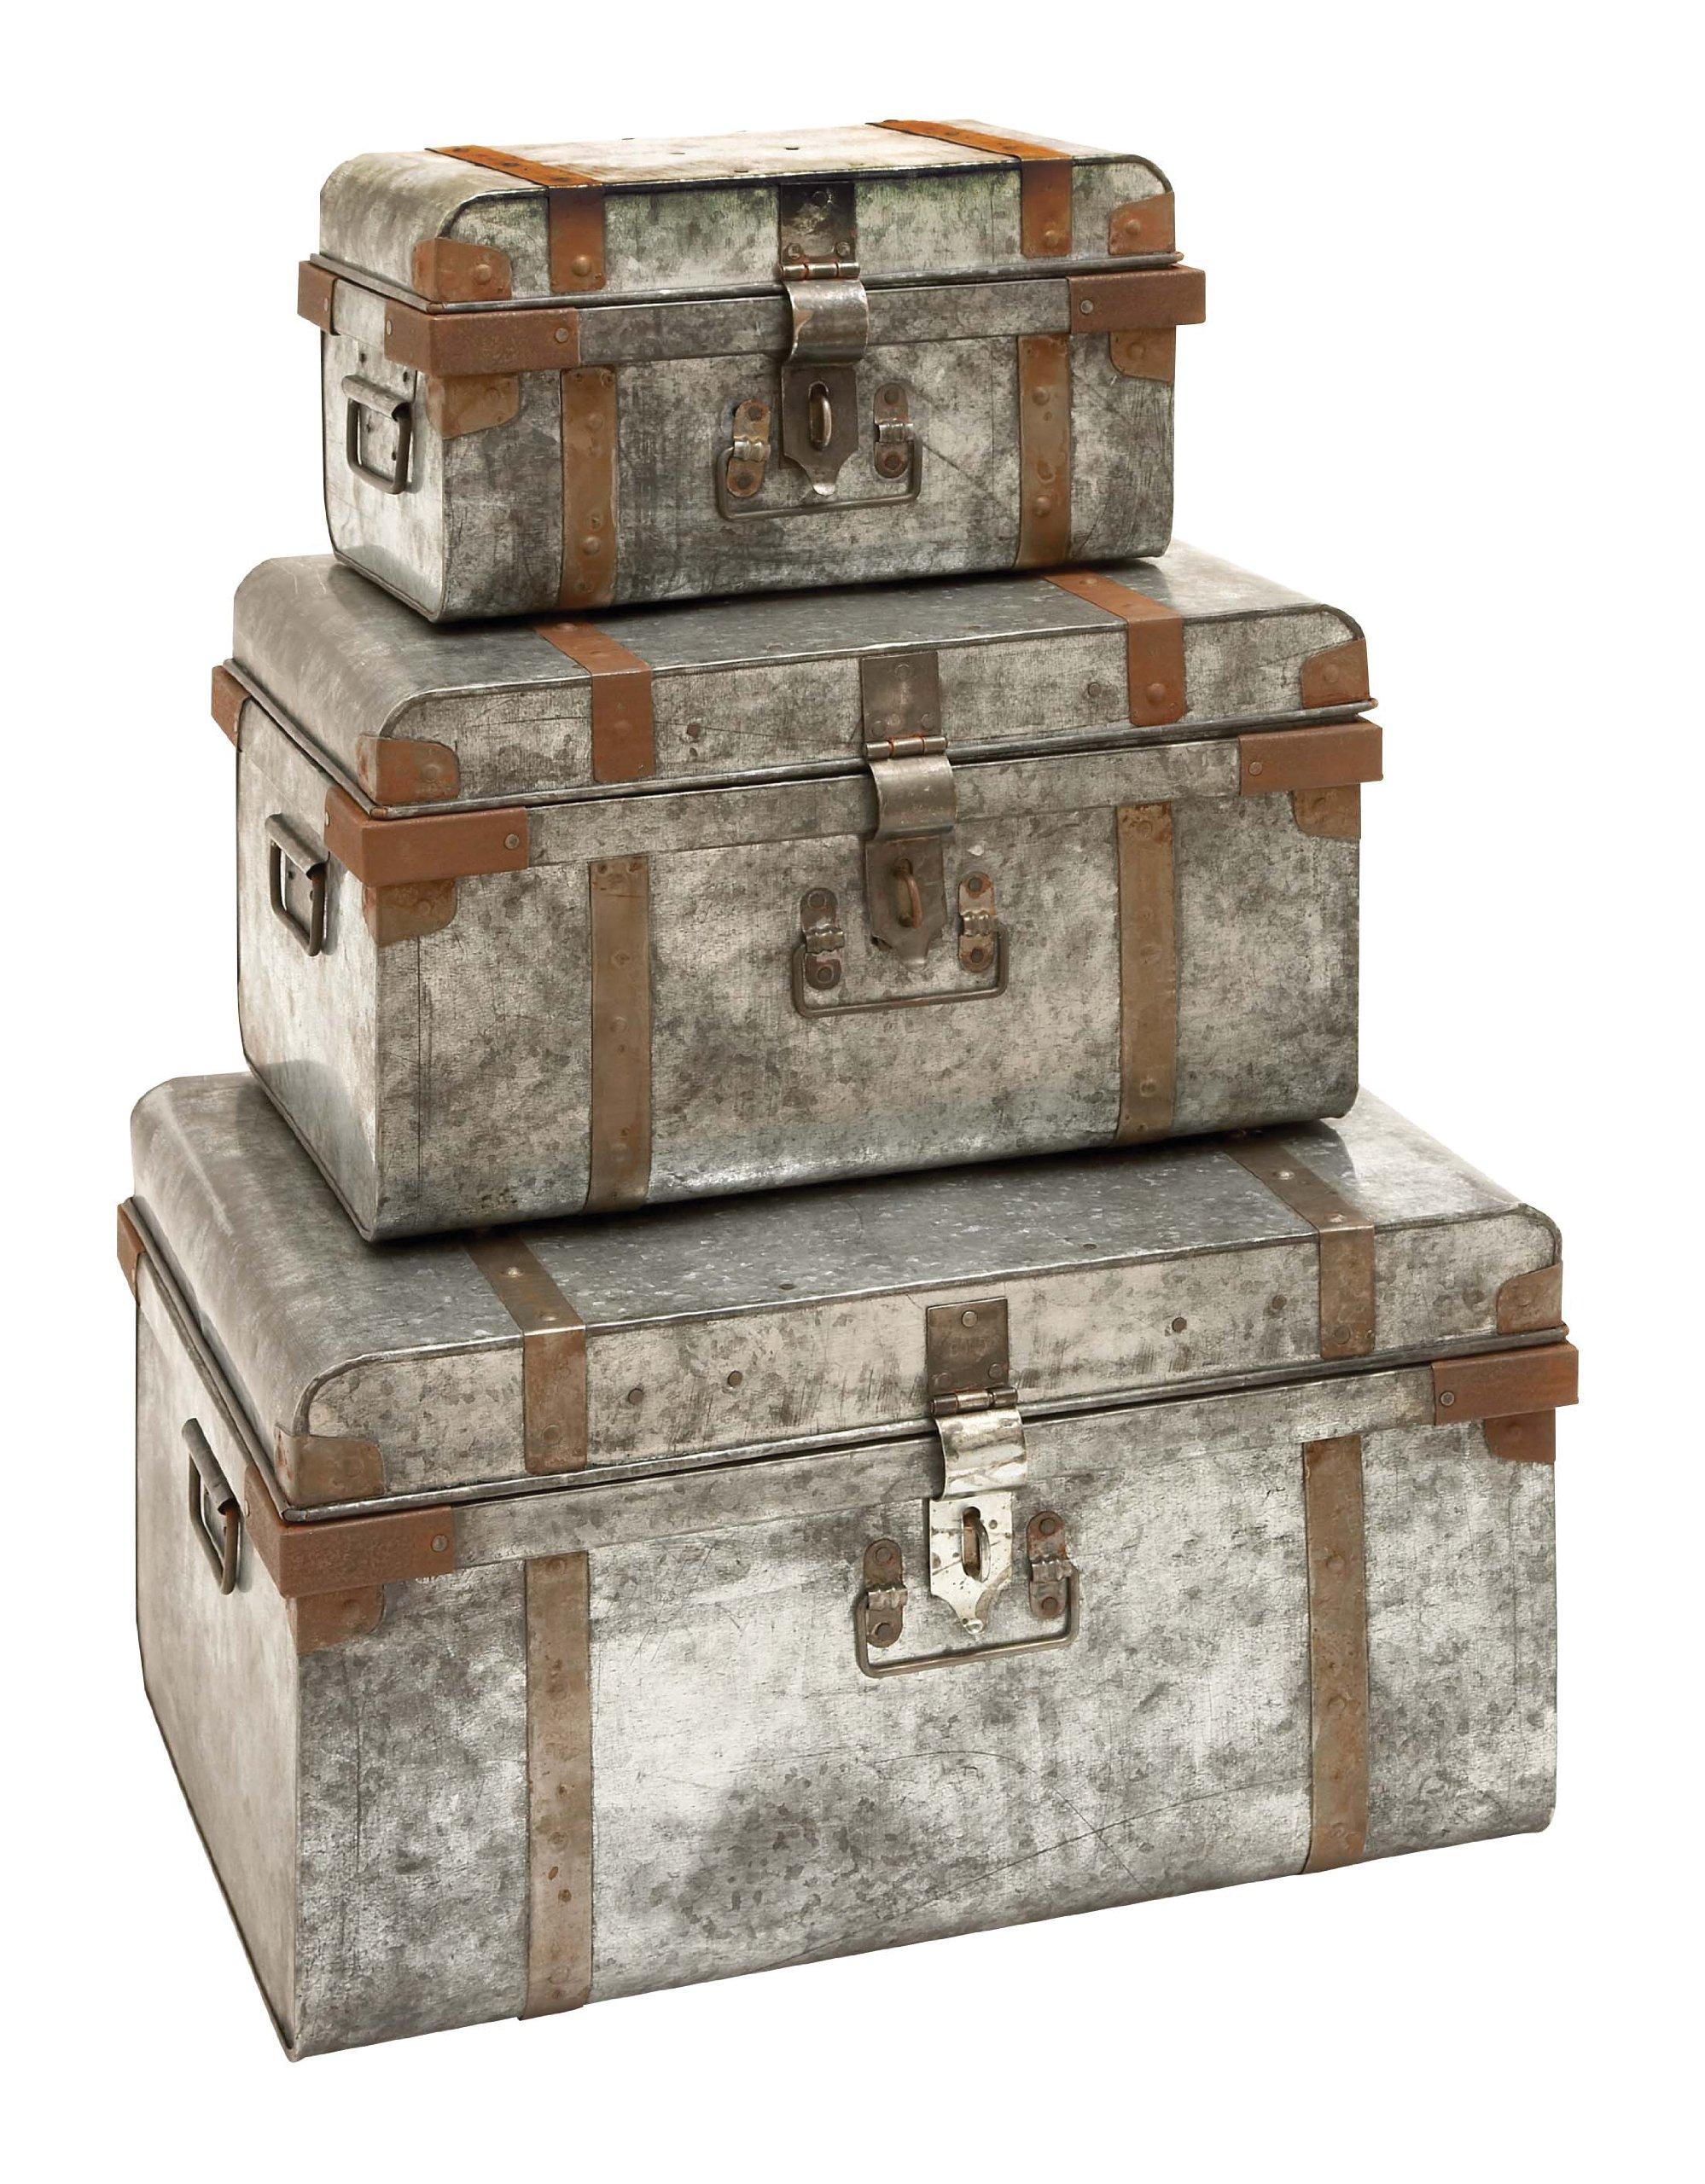 Deco 79 38180 Metal Galvan Trunks (Set of 3), 23''/19''/15''